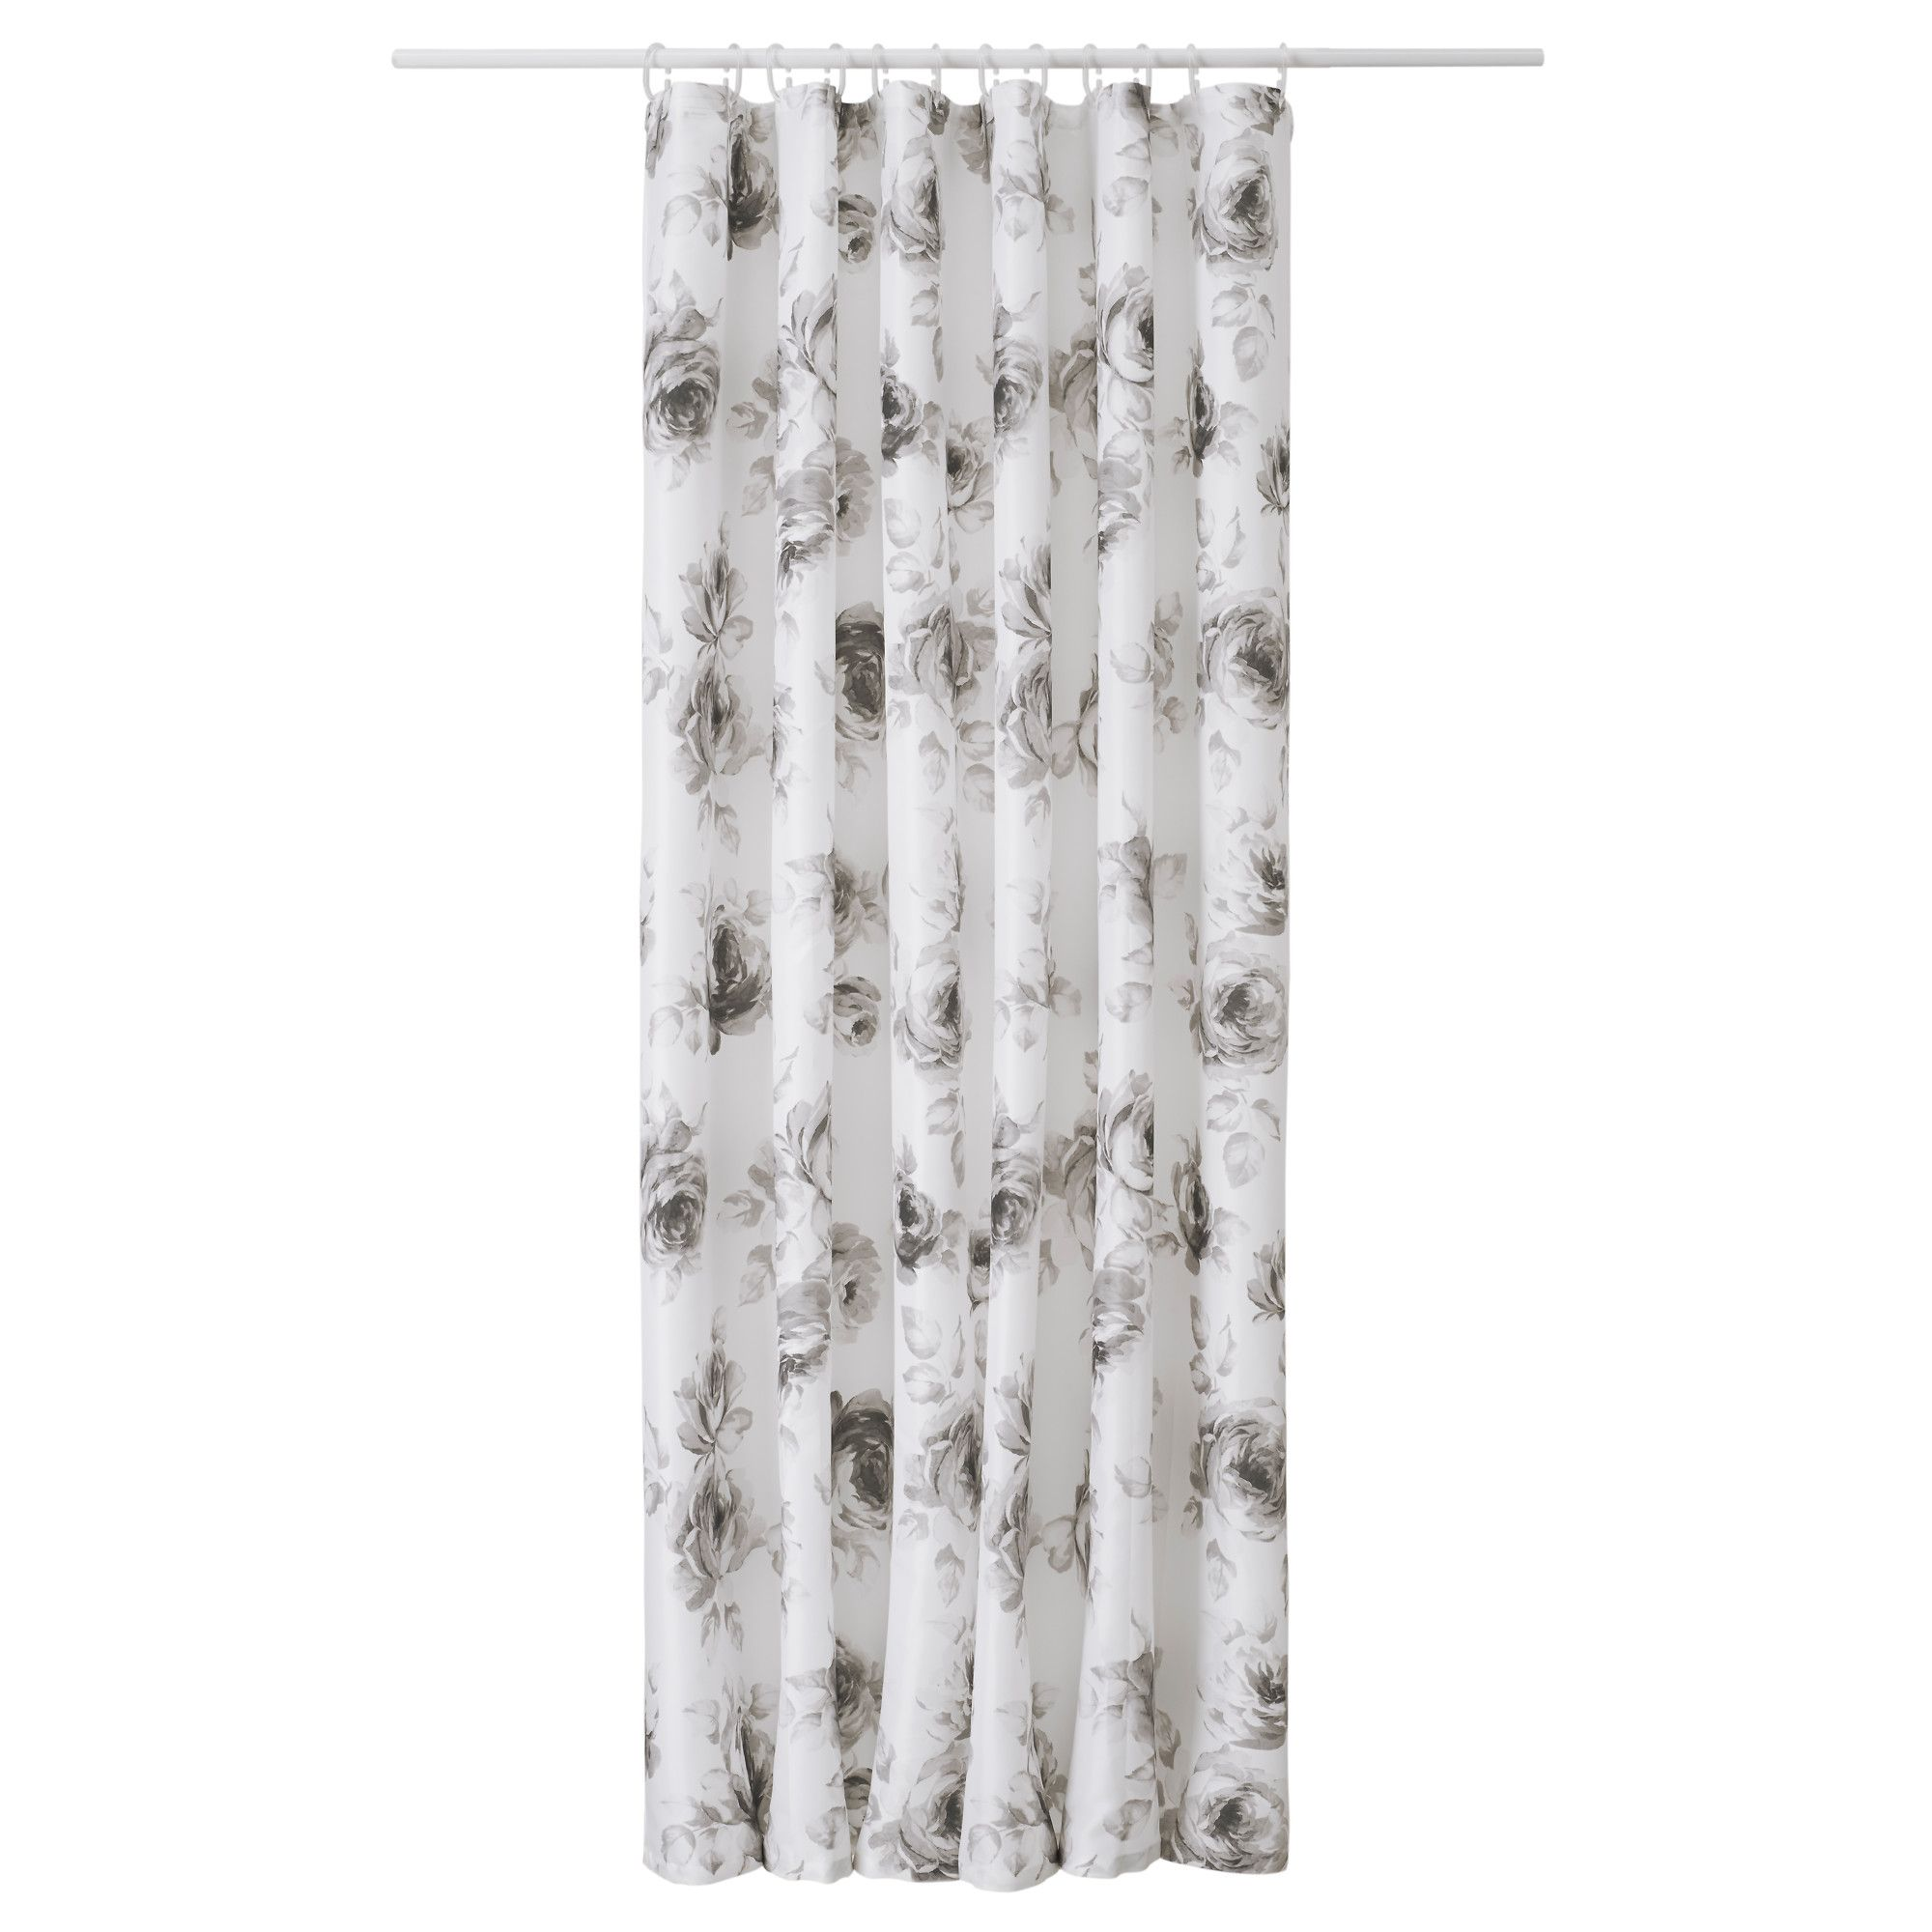 Aggersund Shower Curtain Gray White 71x71 Gray Shower Curtains